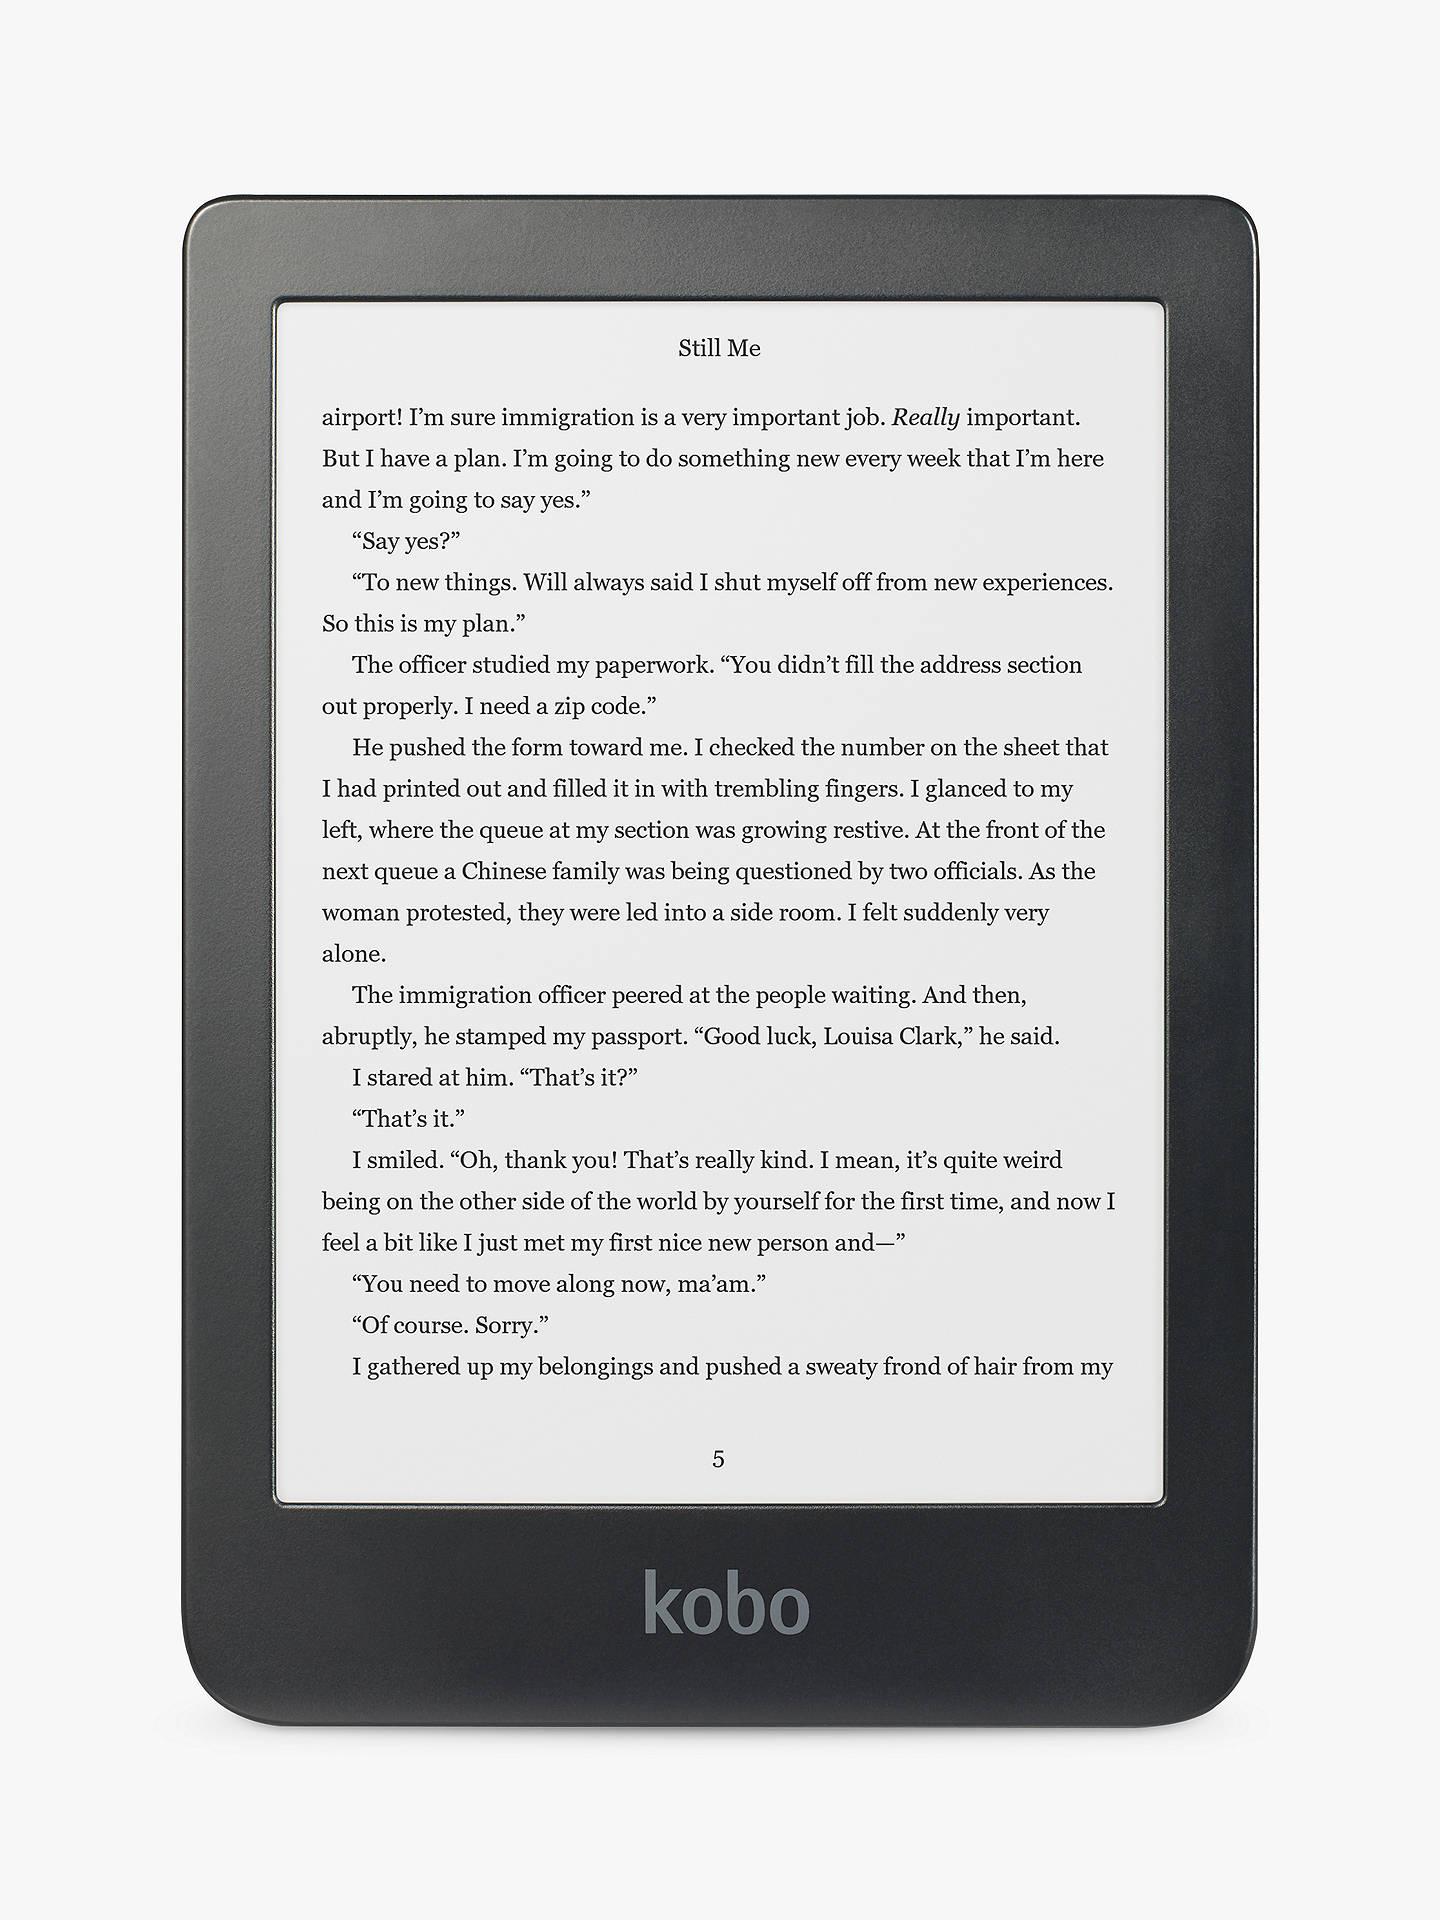 Kobo Clara E-Reader £89.99 at John Lewis & Partners - 2 year guarantee